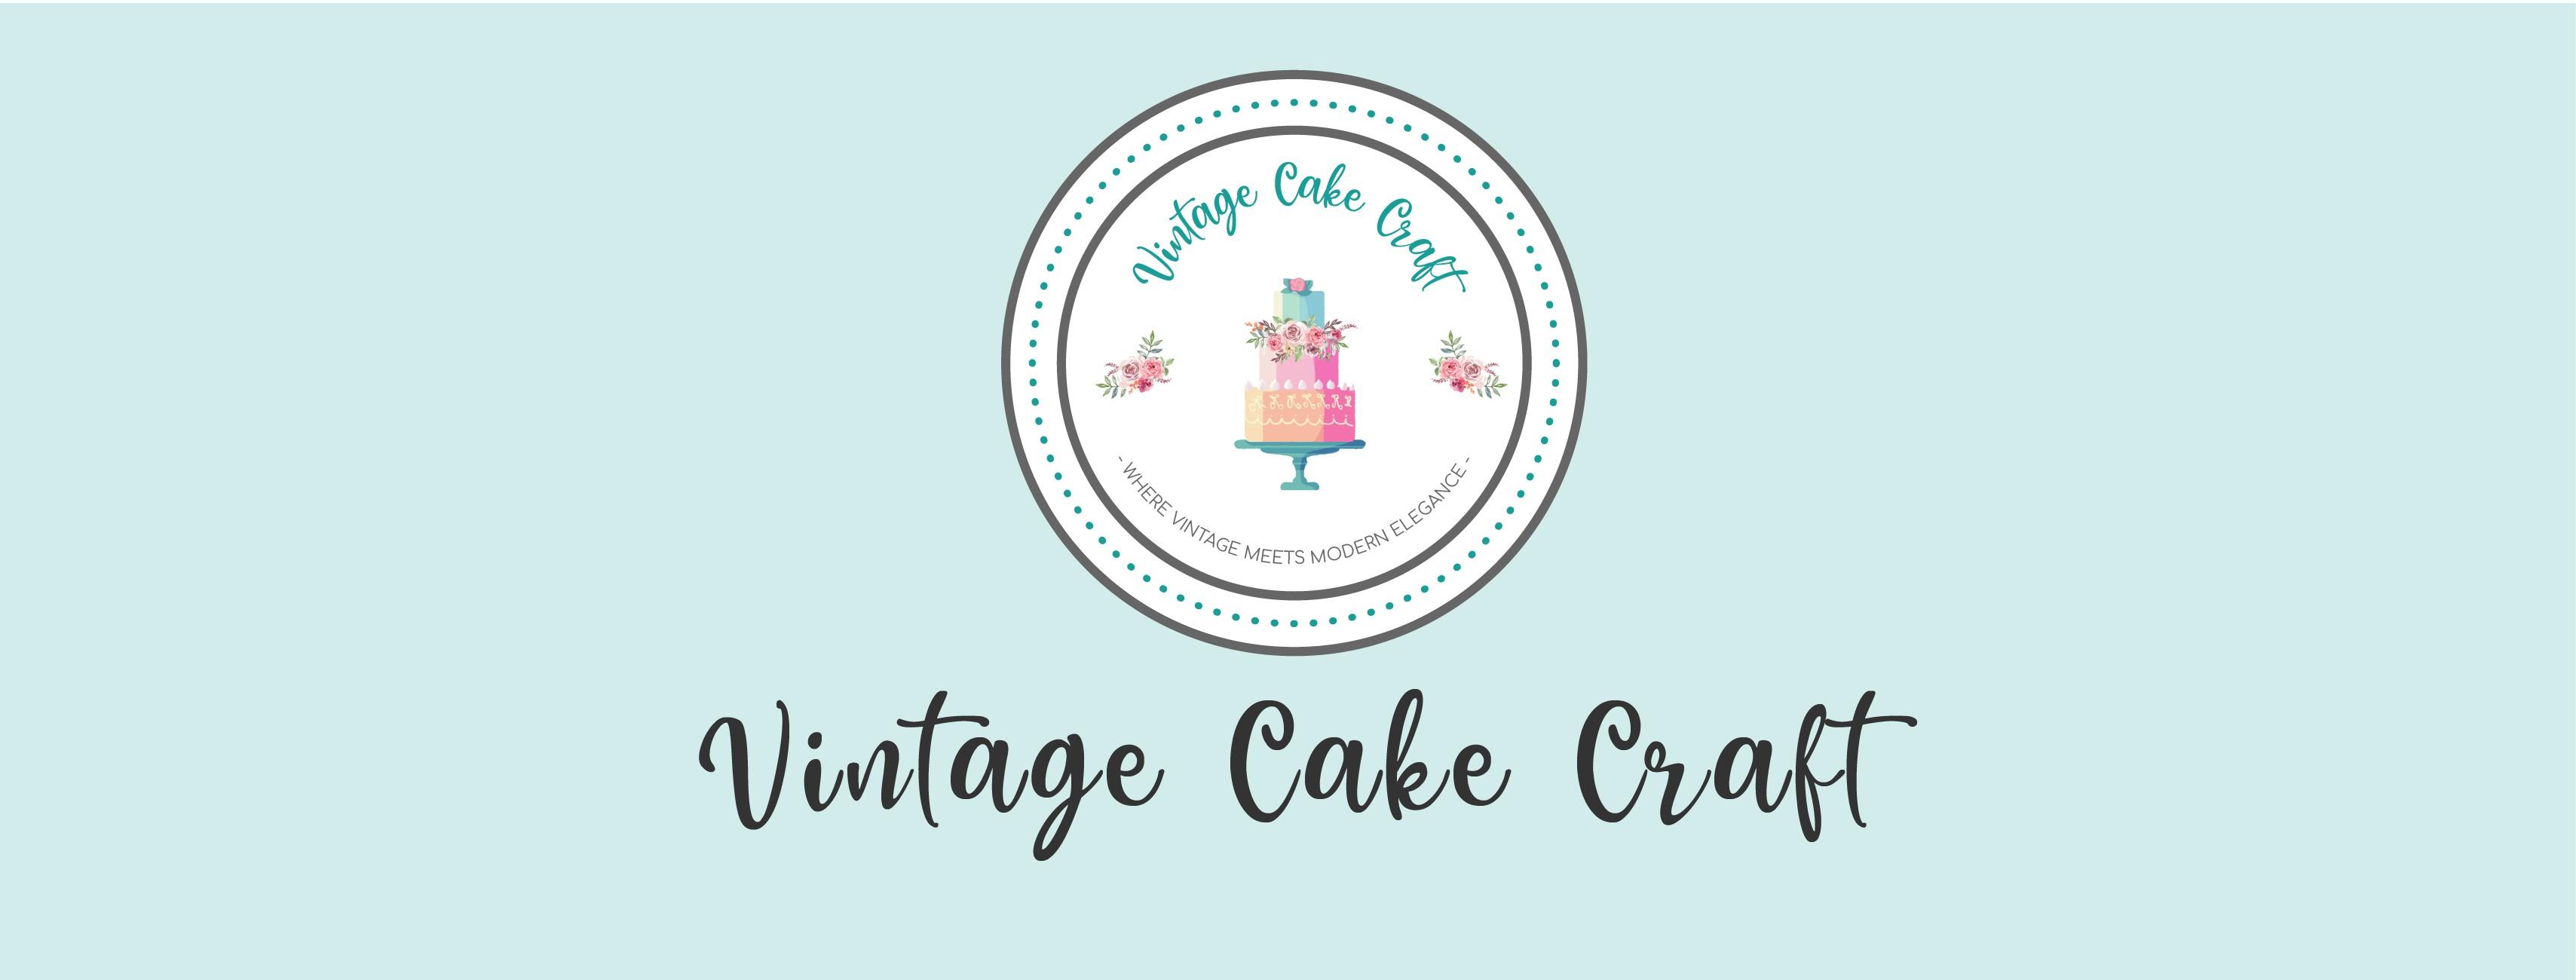 Vintage Cake Craft